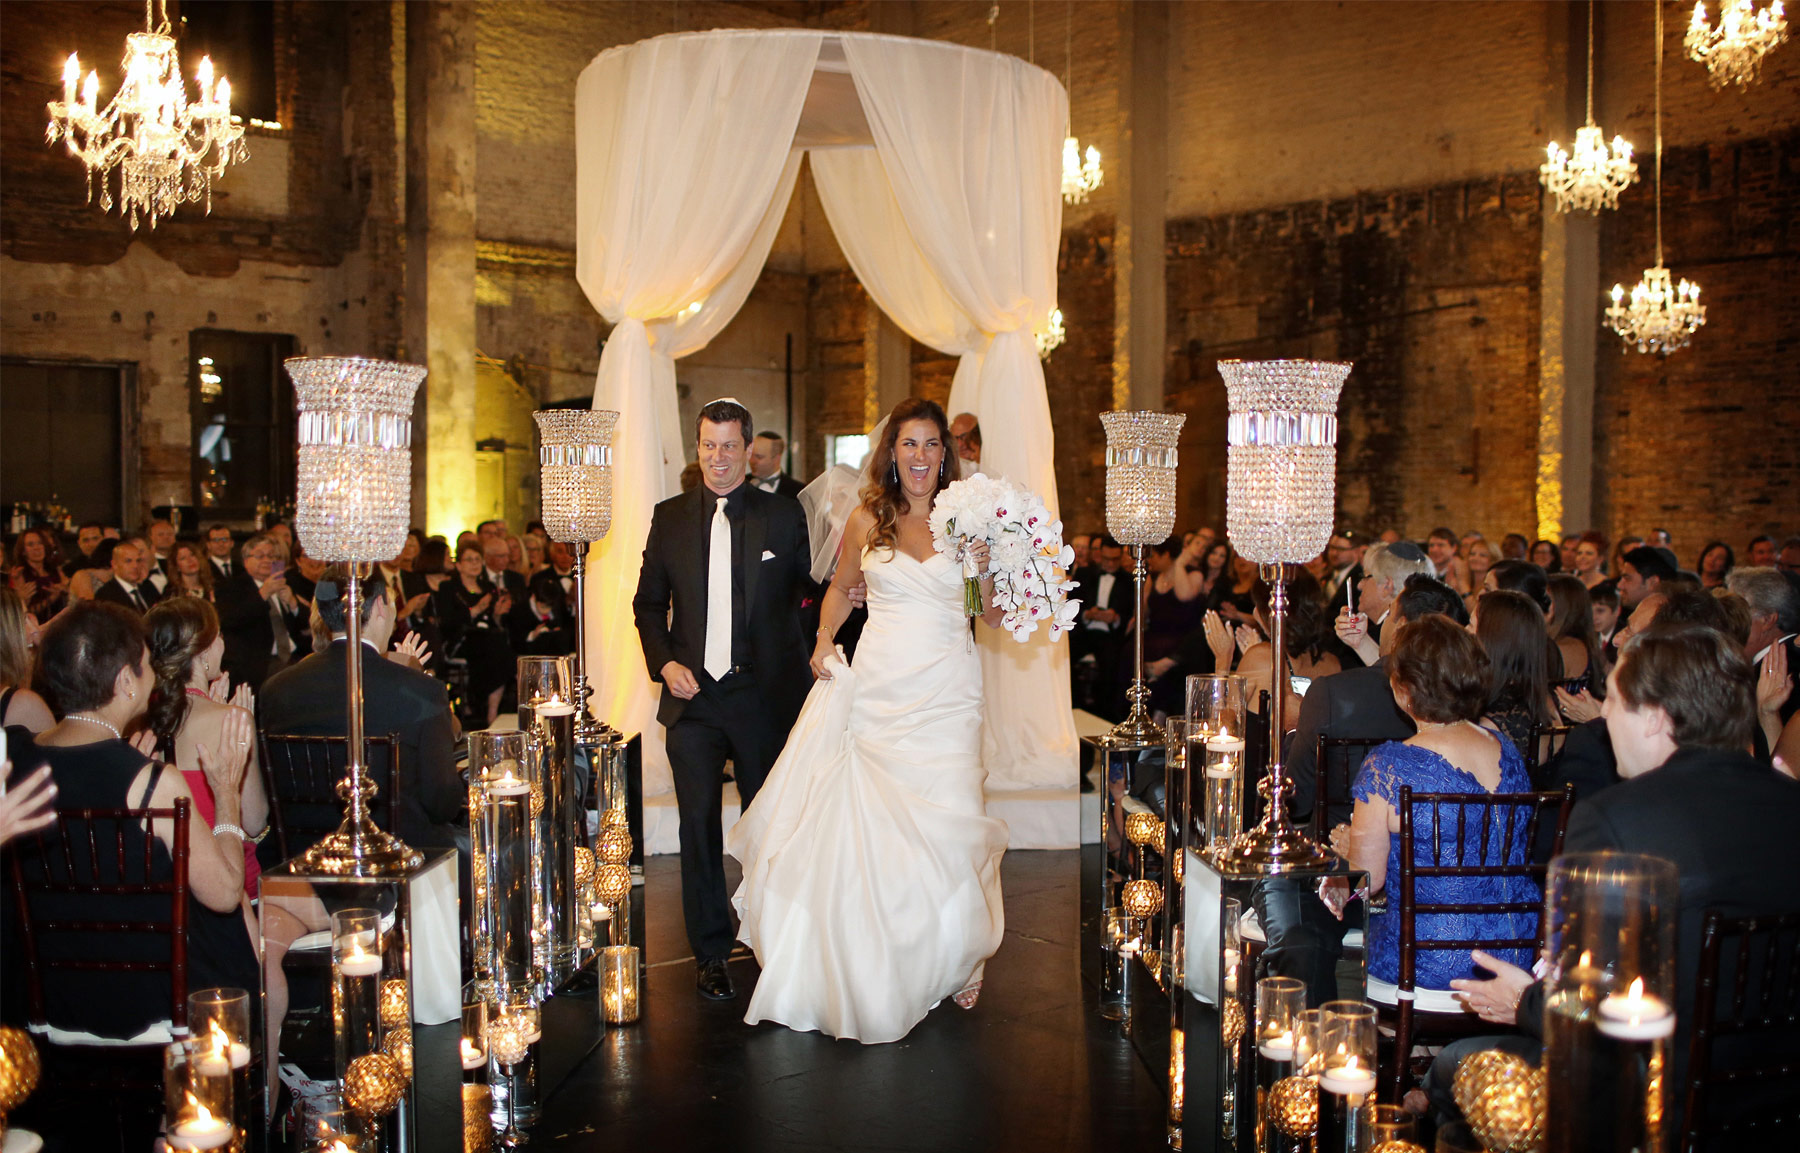 12-Minneapolis-Minnesota-Wedding-Photography-by-Vick-Photography-Aria-Downtown-Ceremony-Layne-&-Dan.jpg